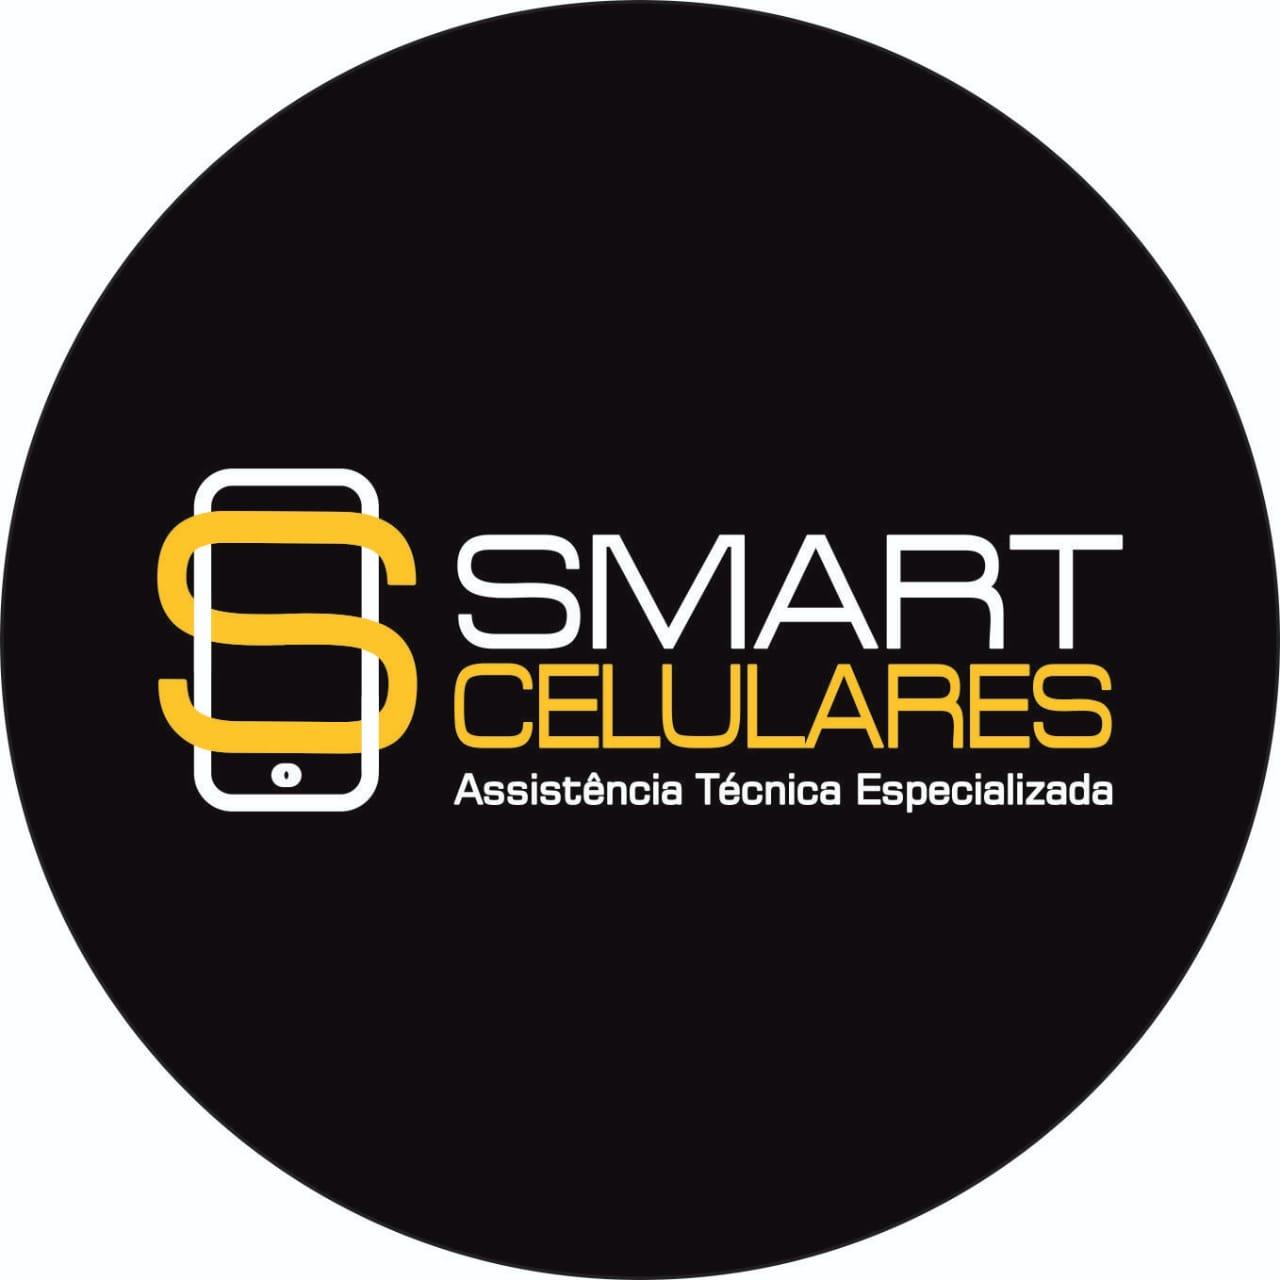 SMART CELULARES